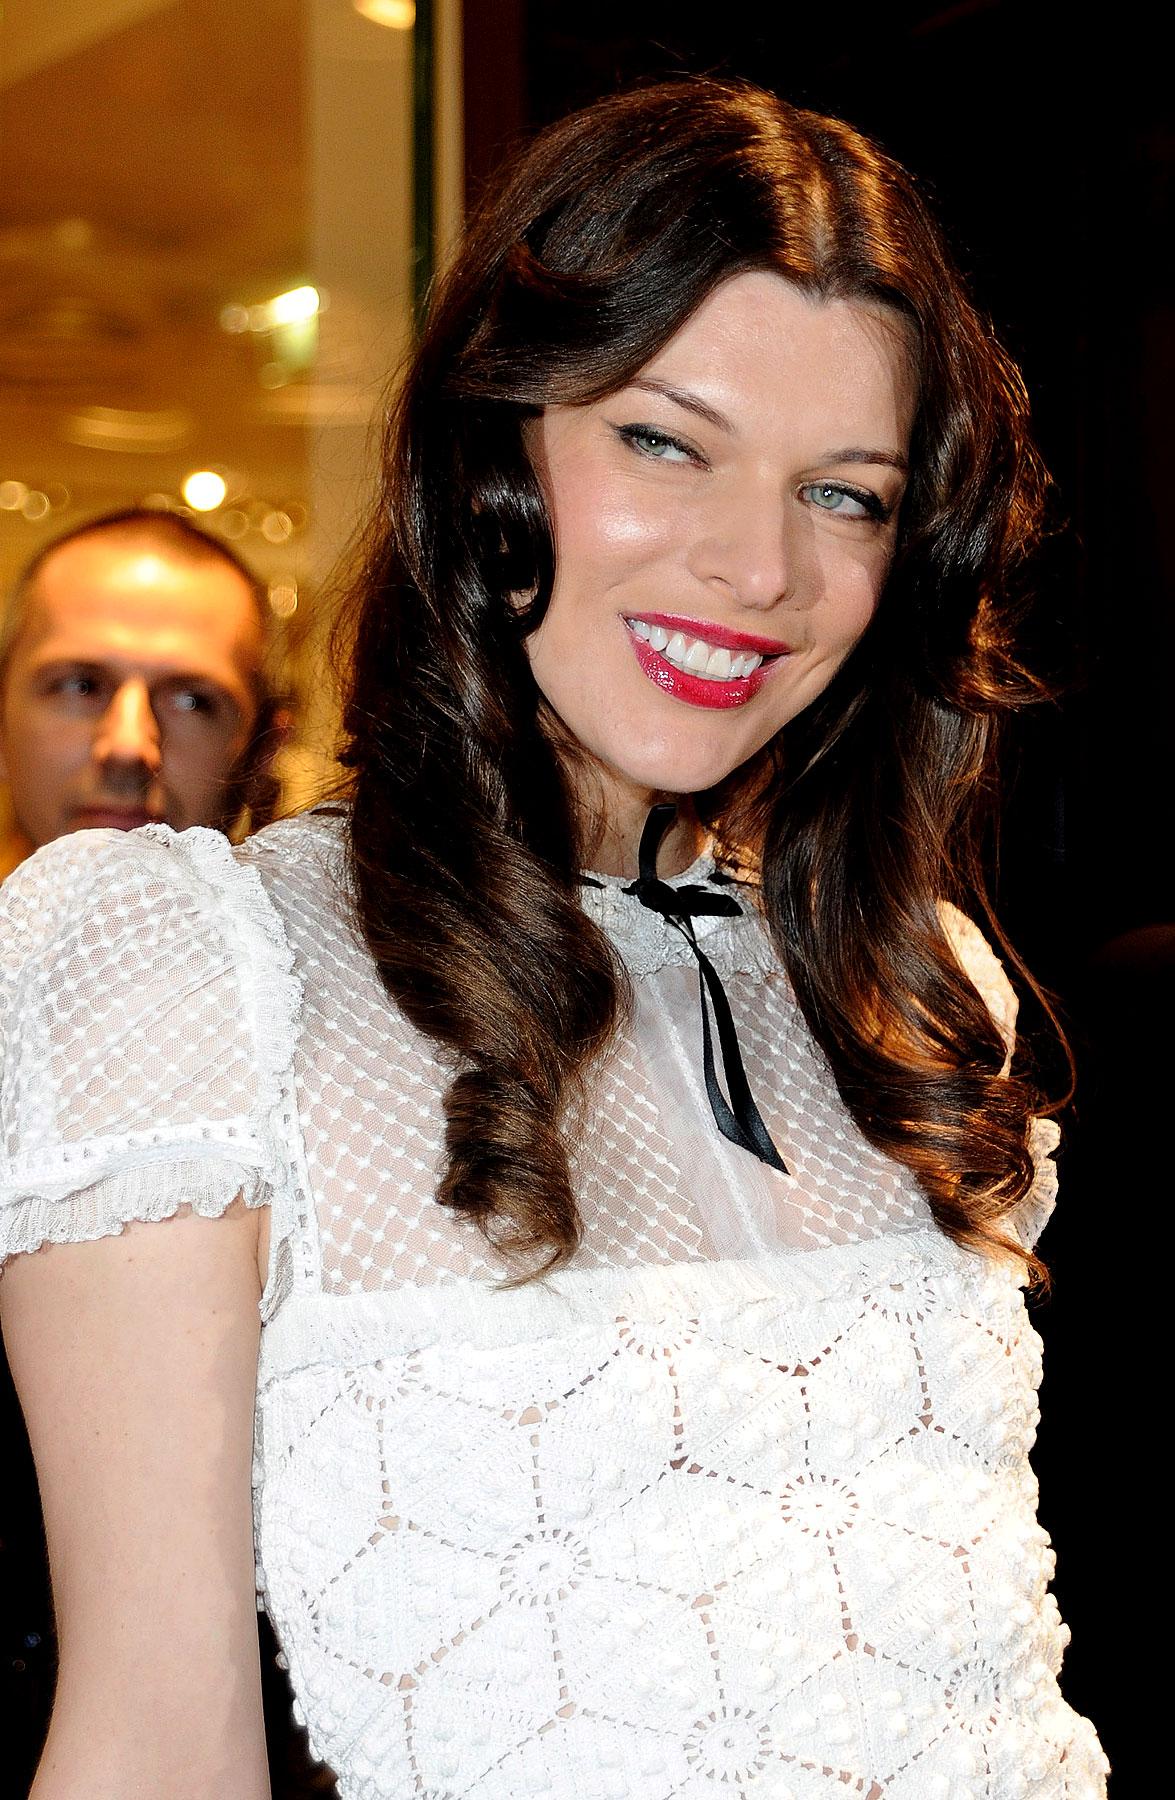 Mila Jovovich